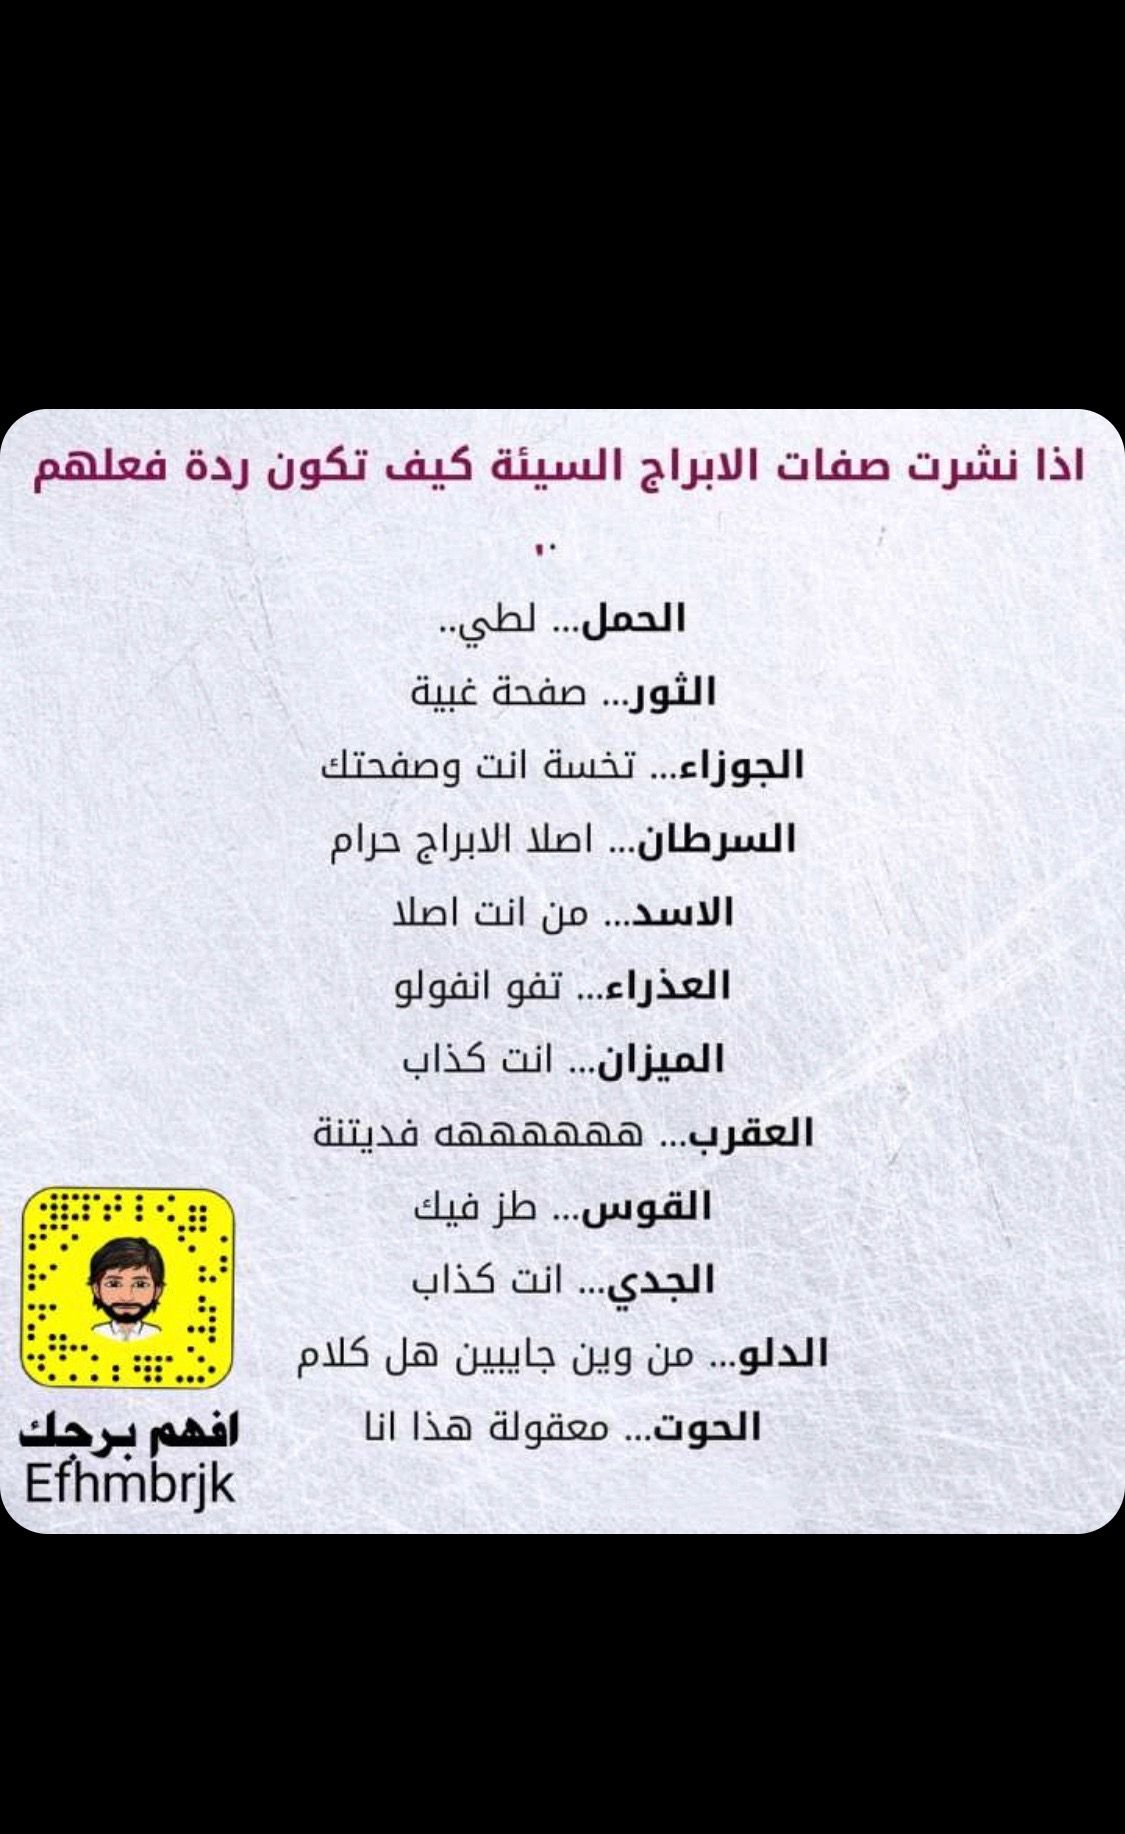 Pin By Lara Moon On ابراج Quran Quotes Love Quran Quotes Arabic Funny